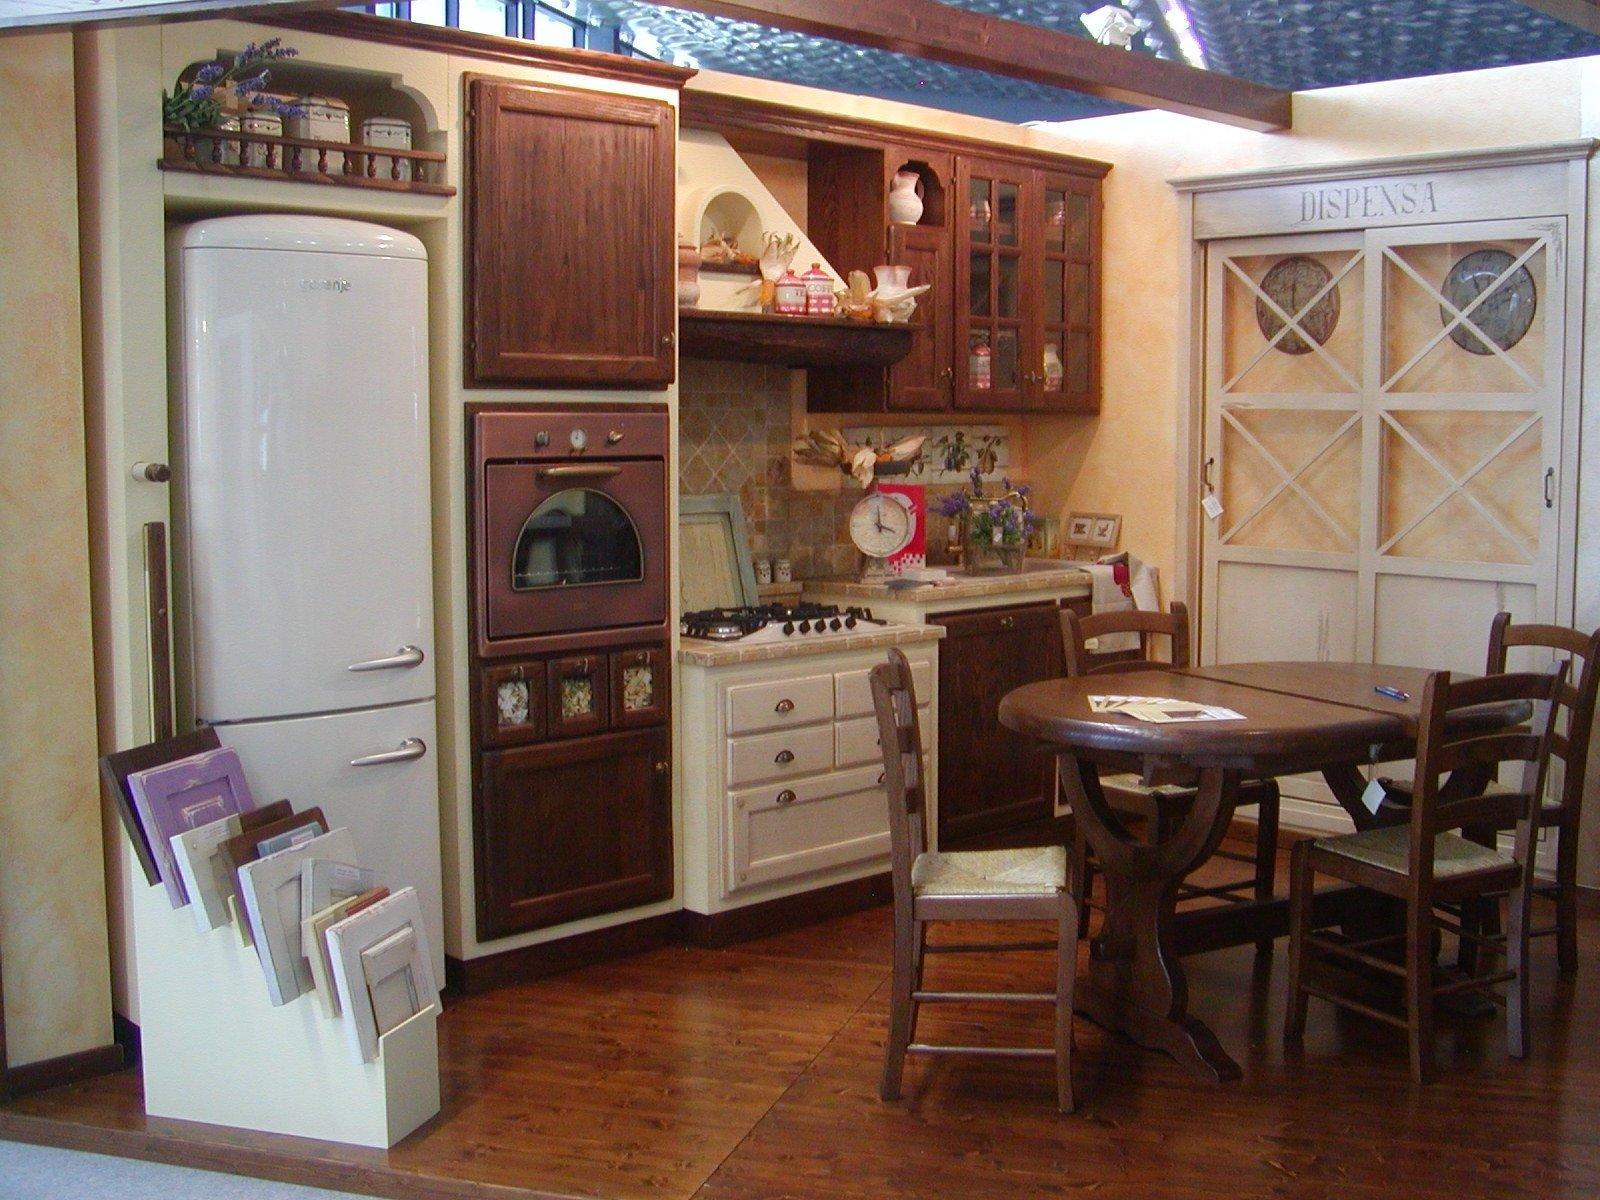 Cucine in legno genova falegnameria cirigliano - Cucine in muratura genova ...